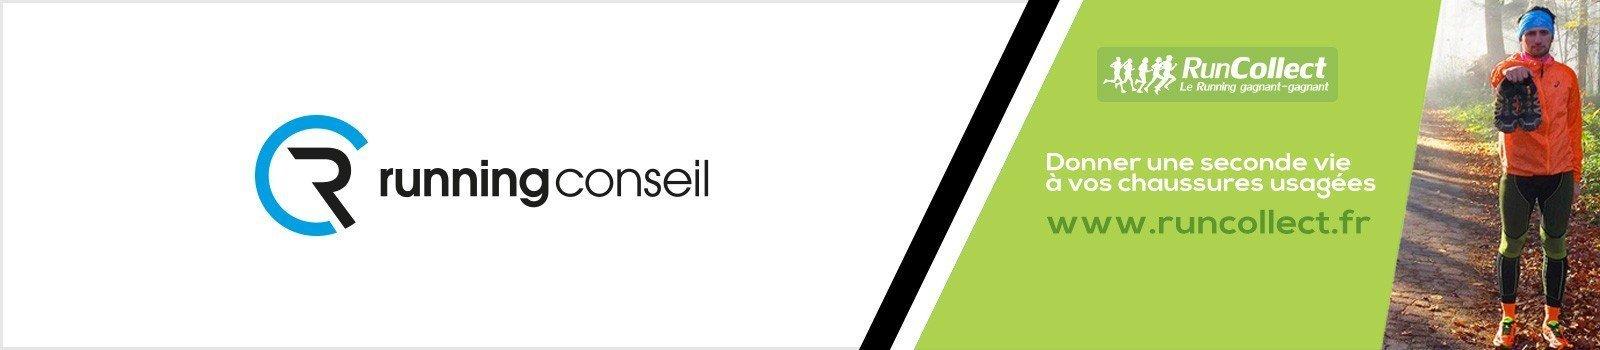 Running Conseil devient partenaire de RunCollect !